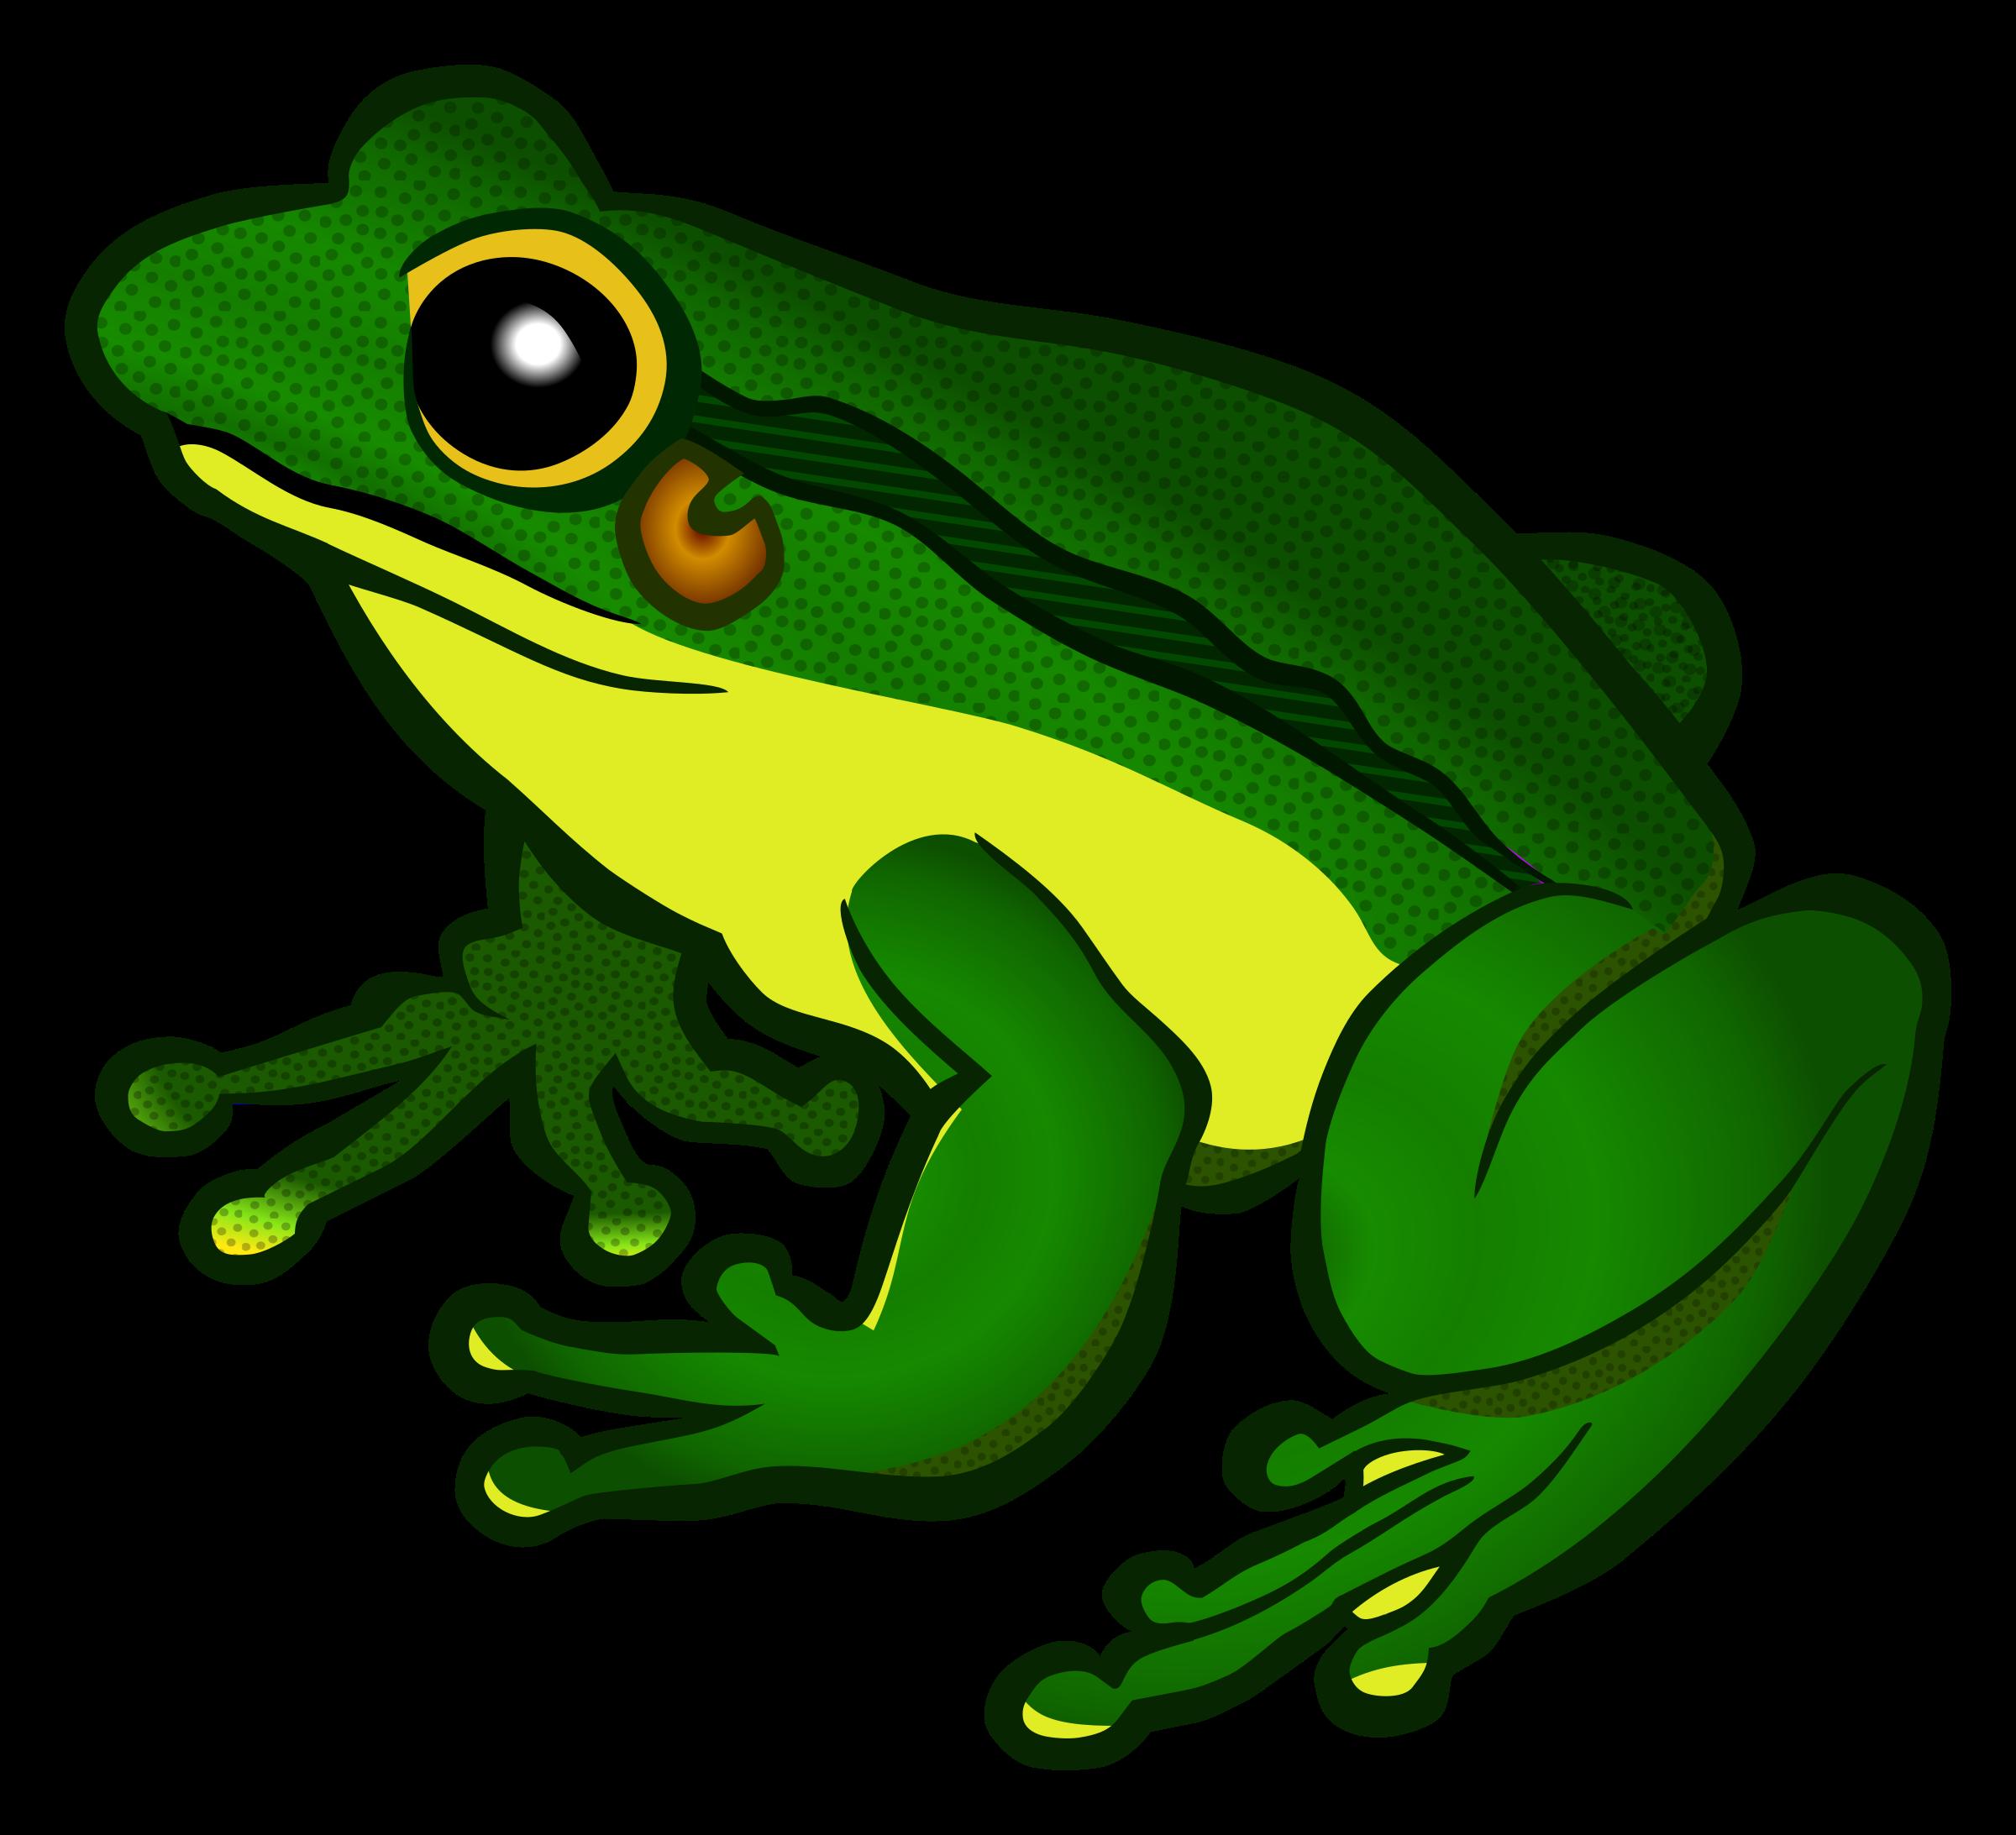 Frog png images transparent. Frogs clipart bullfrog